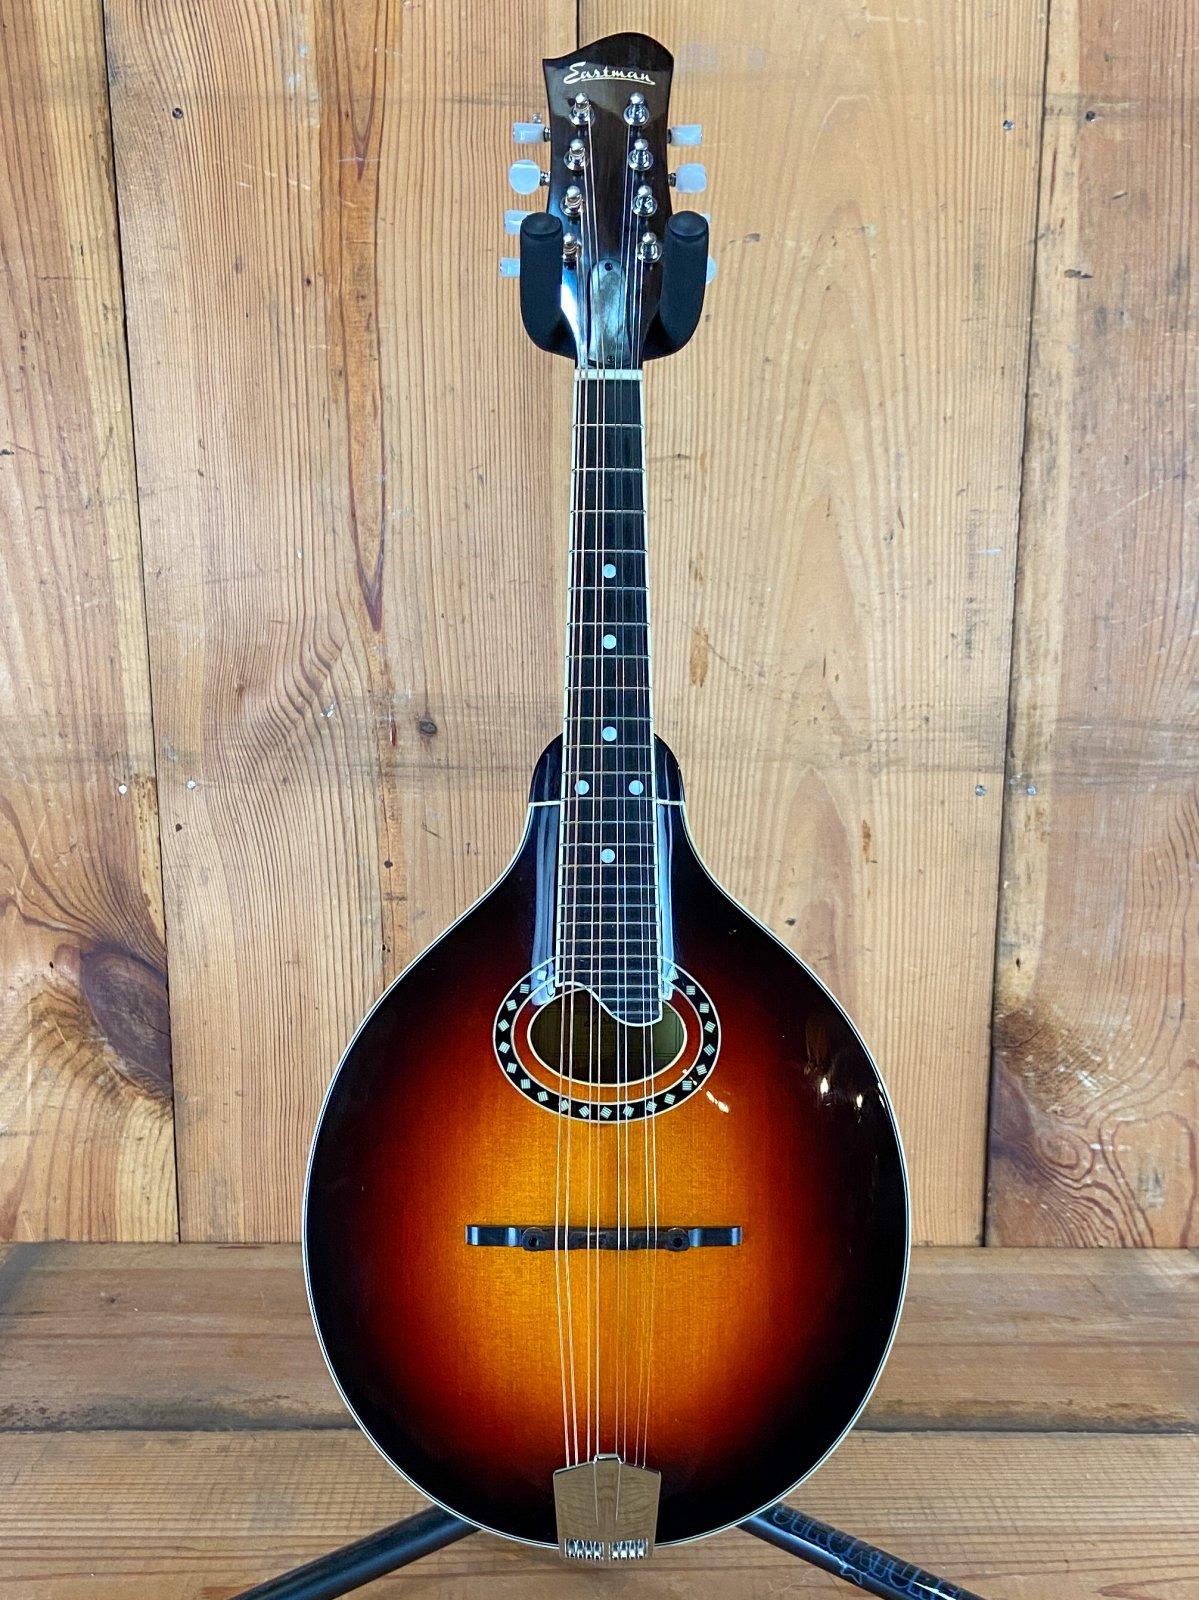 Used Eastman MD504 Oval Hole A-Style Mandolin